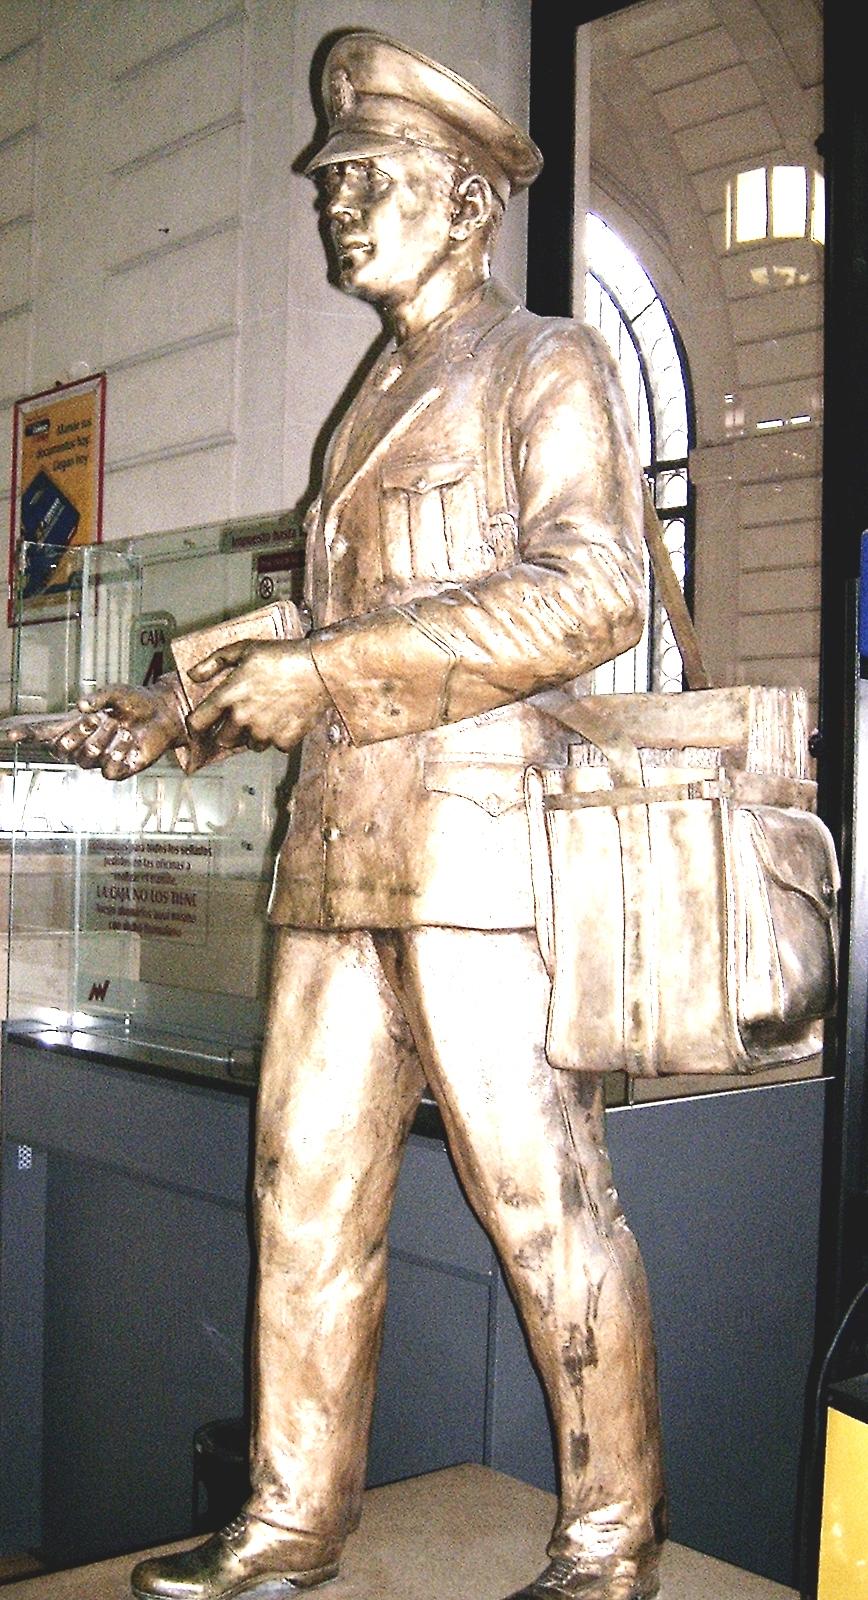 http://upload.wikimedia.org/wikipedia/commons/5/51/Estatua_El_Cartero.jpg